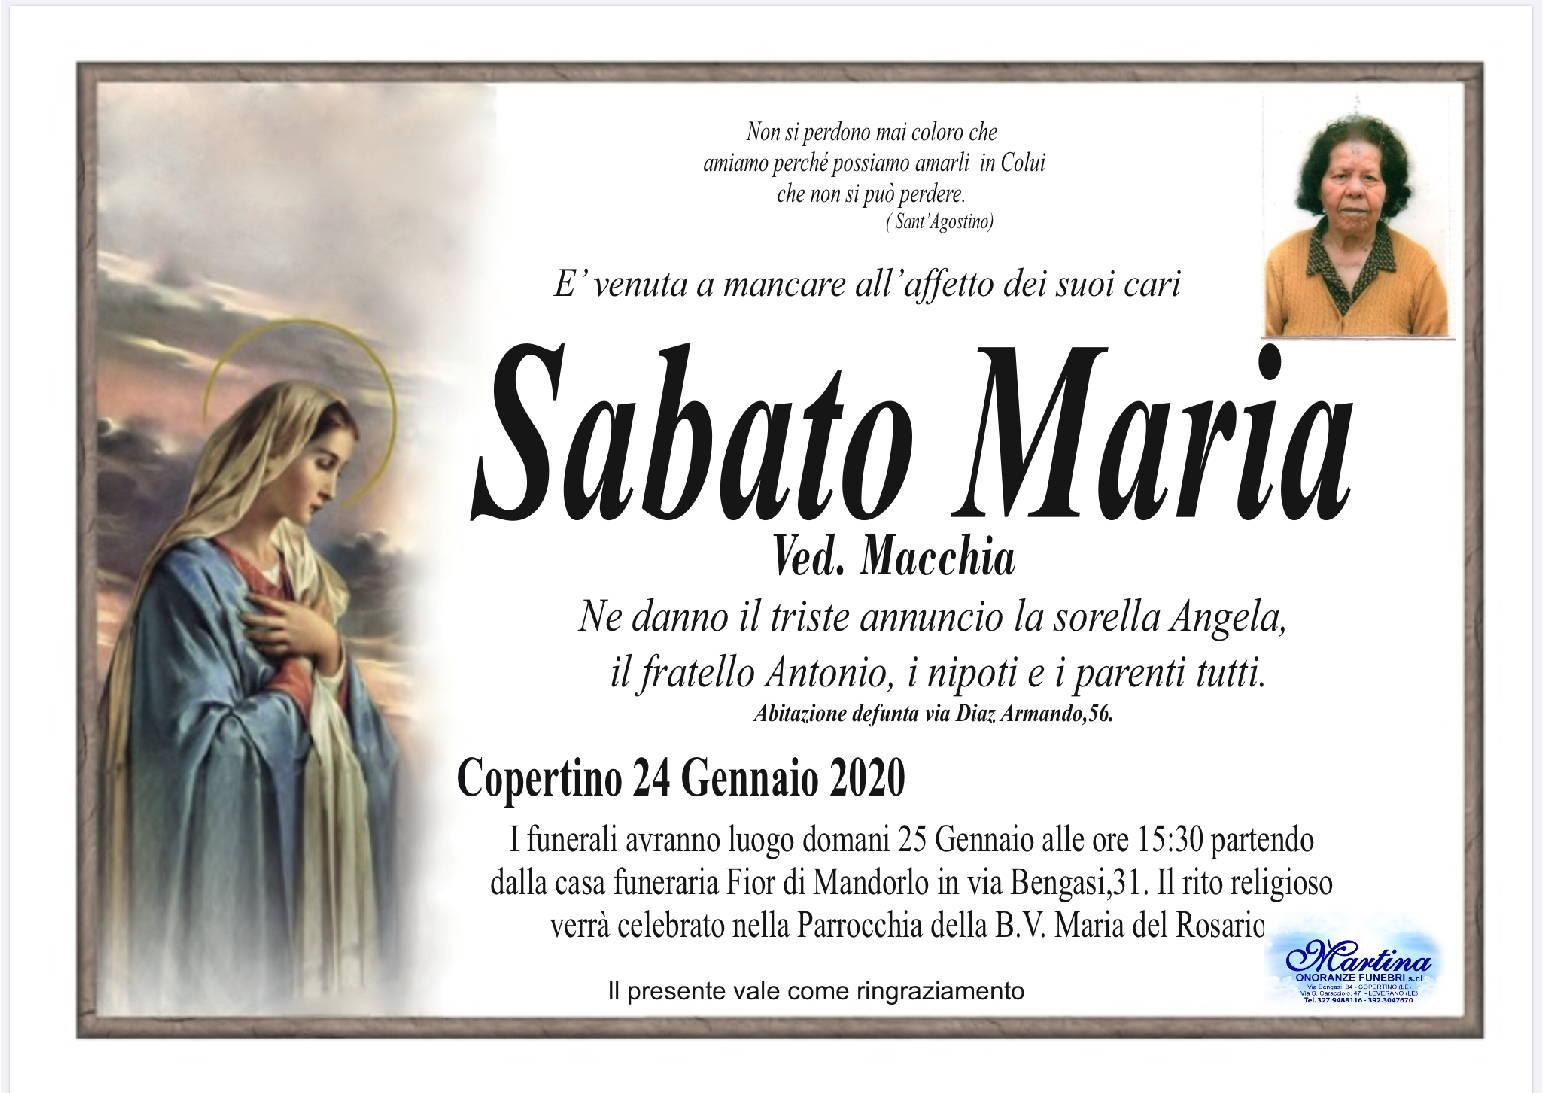 Maria Sabato